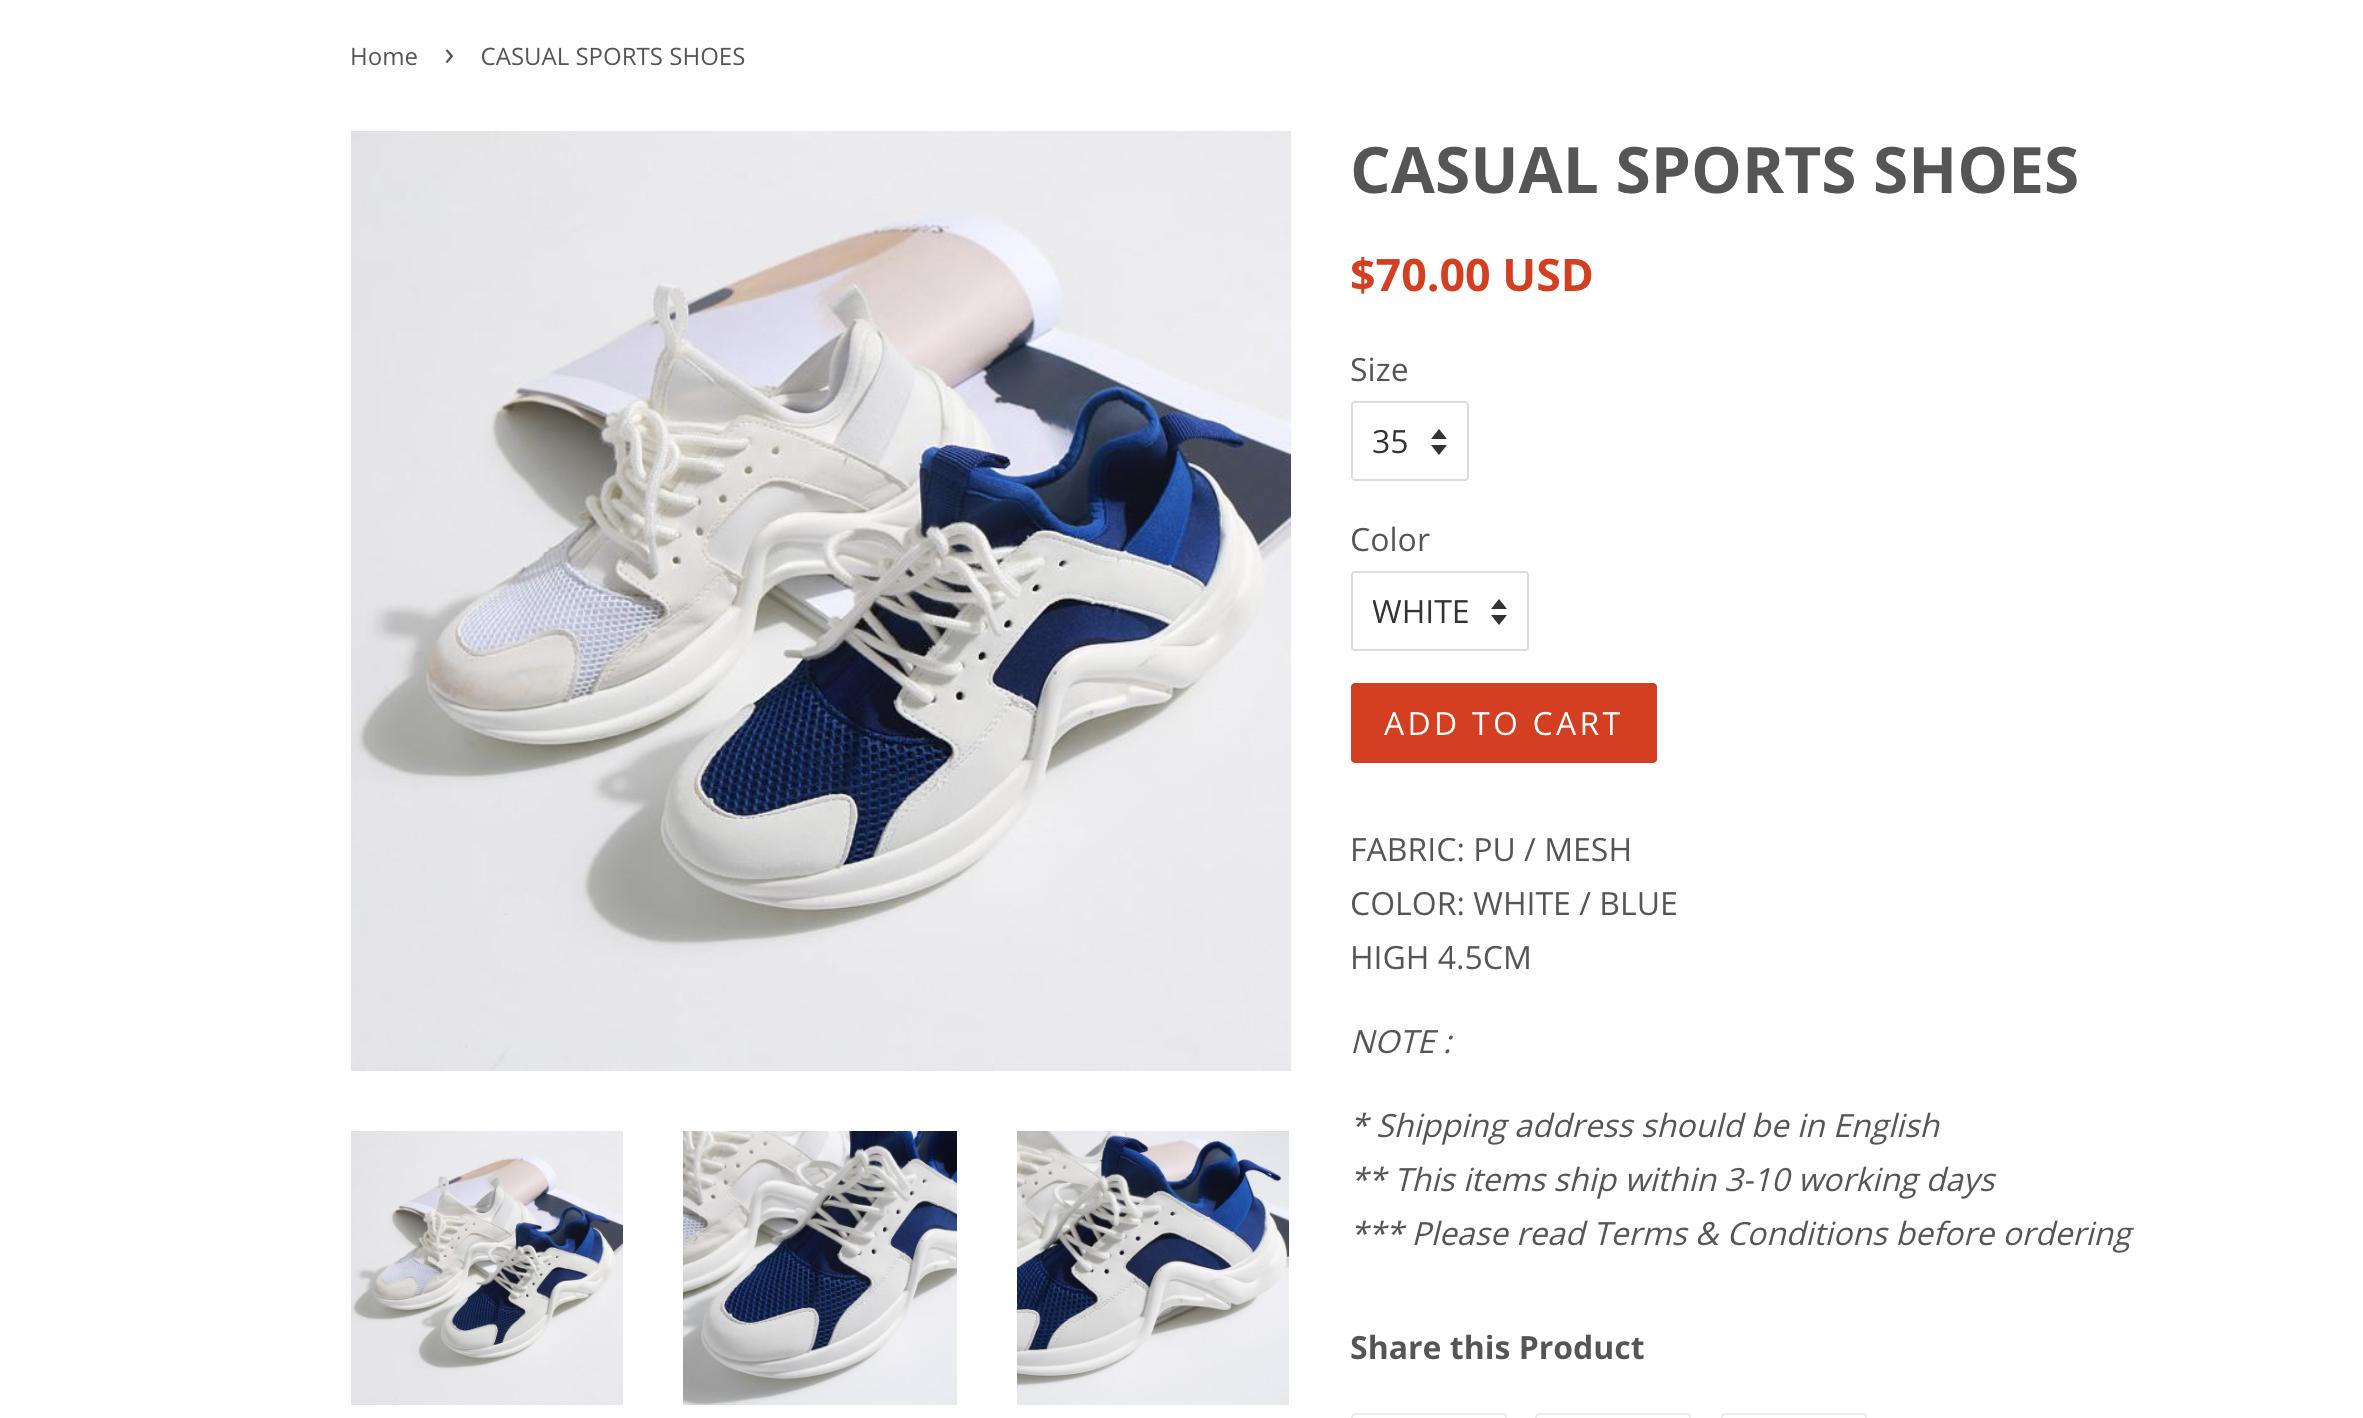 "Louis Vuitton 的 Dad Shoes ""Archlight"" 已经有模仿者了"